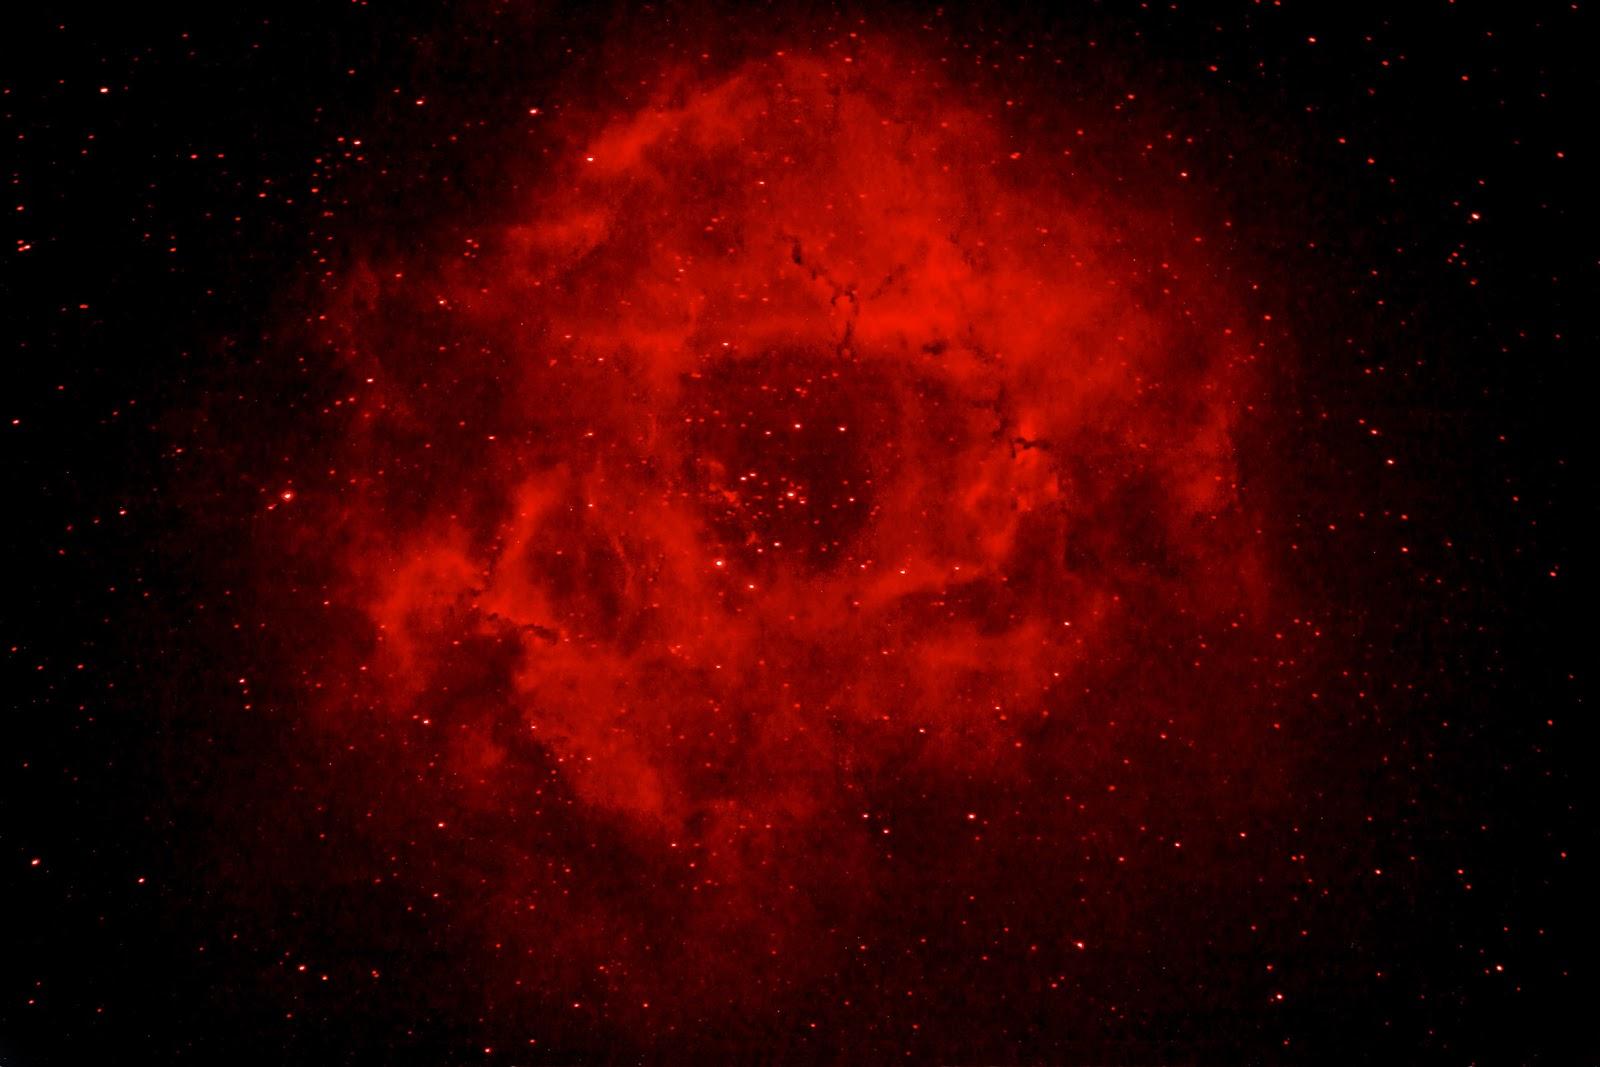 Rosette nebula wallpaper hd earth blog - Galaxy nebula live wallpaper ...